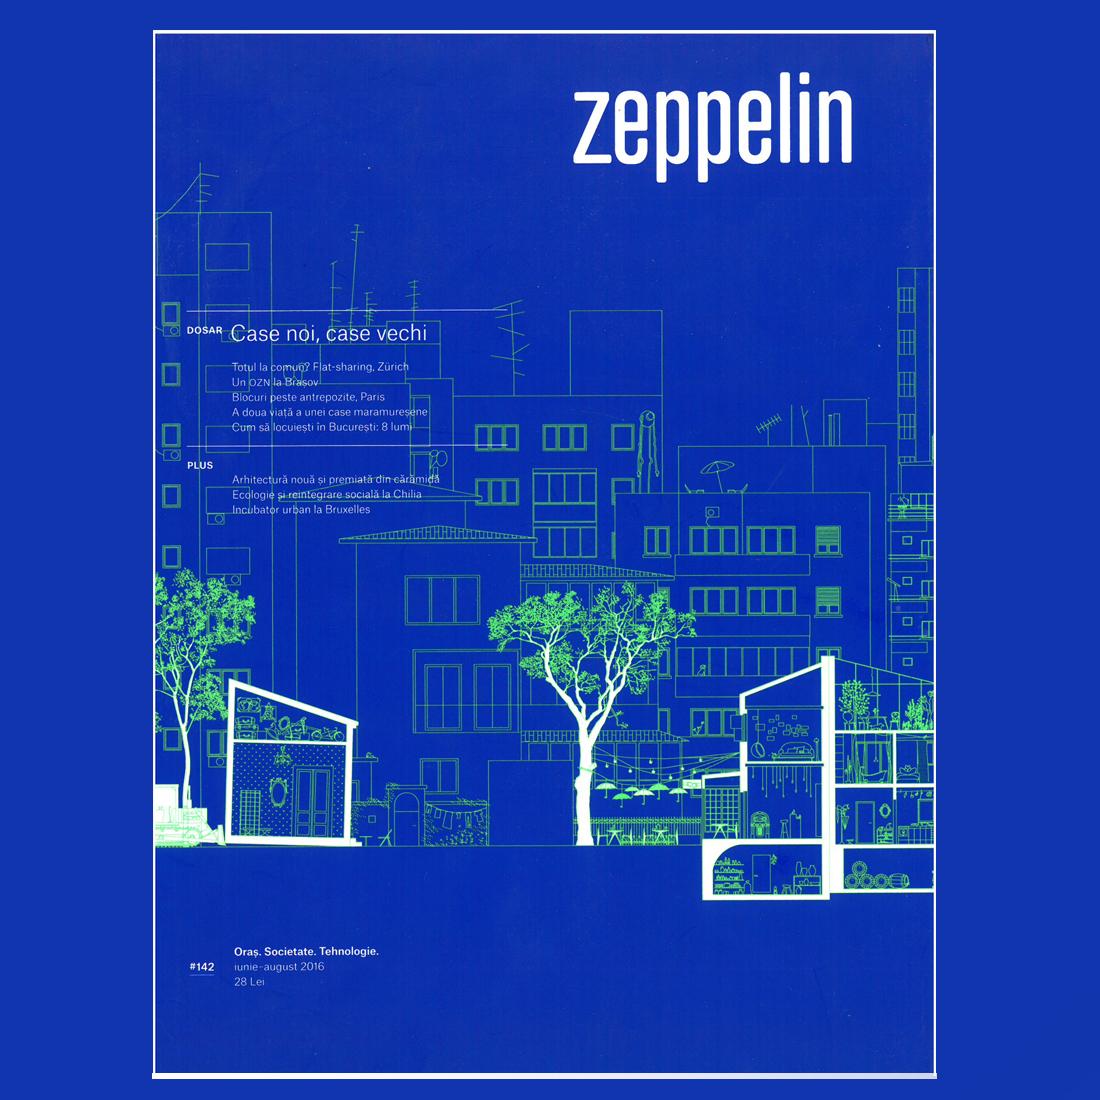 ZEPPELIN N°142 | Brenac & Gonzalez et Associés